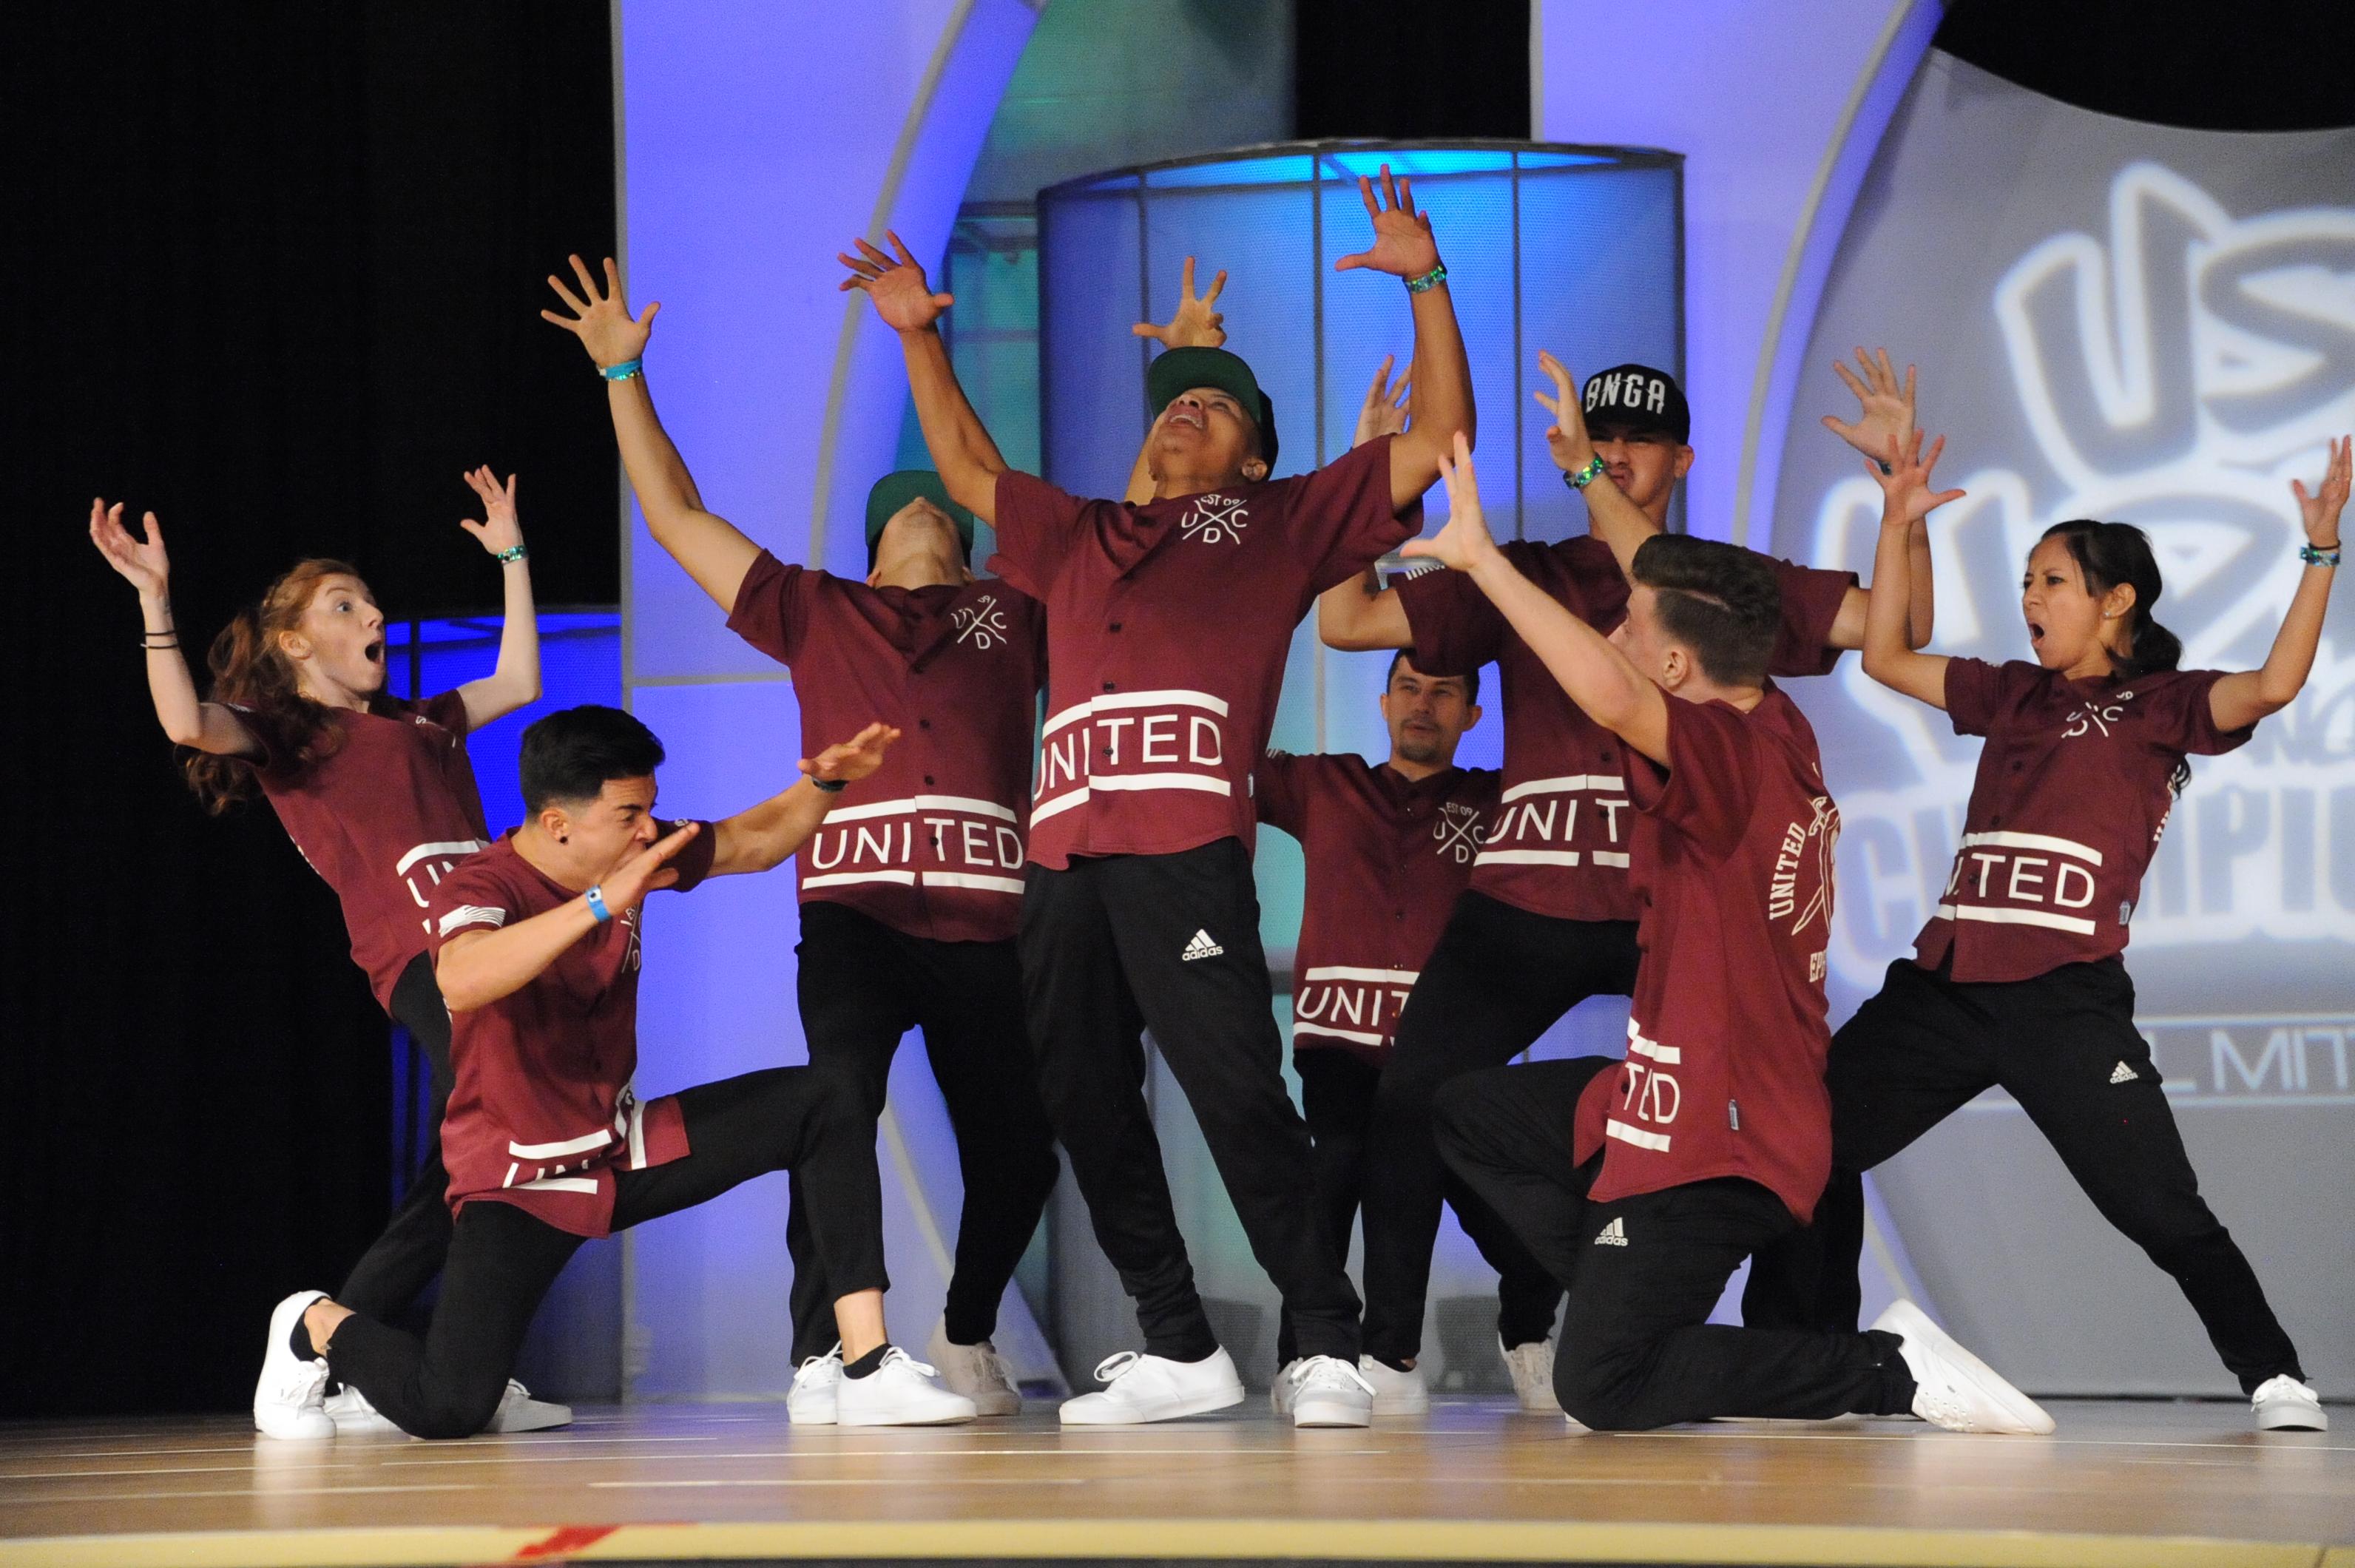 USA_A_United Dance Crew-01